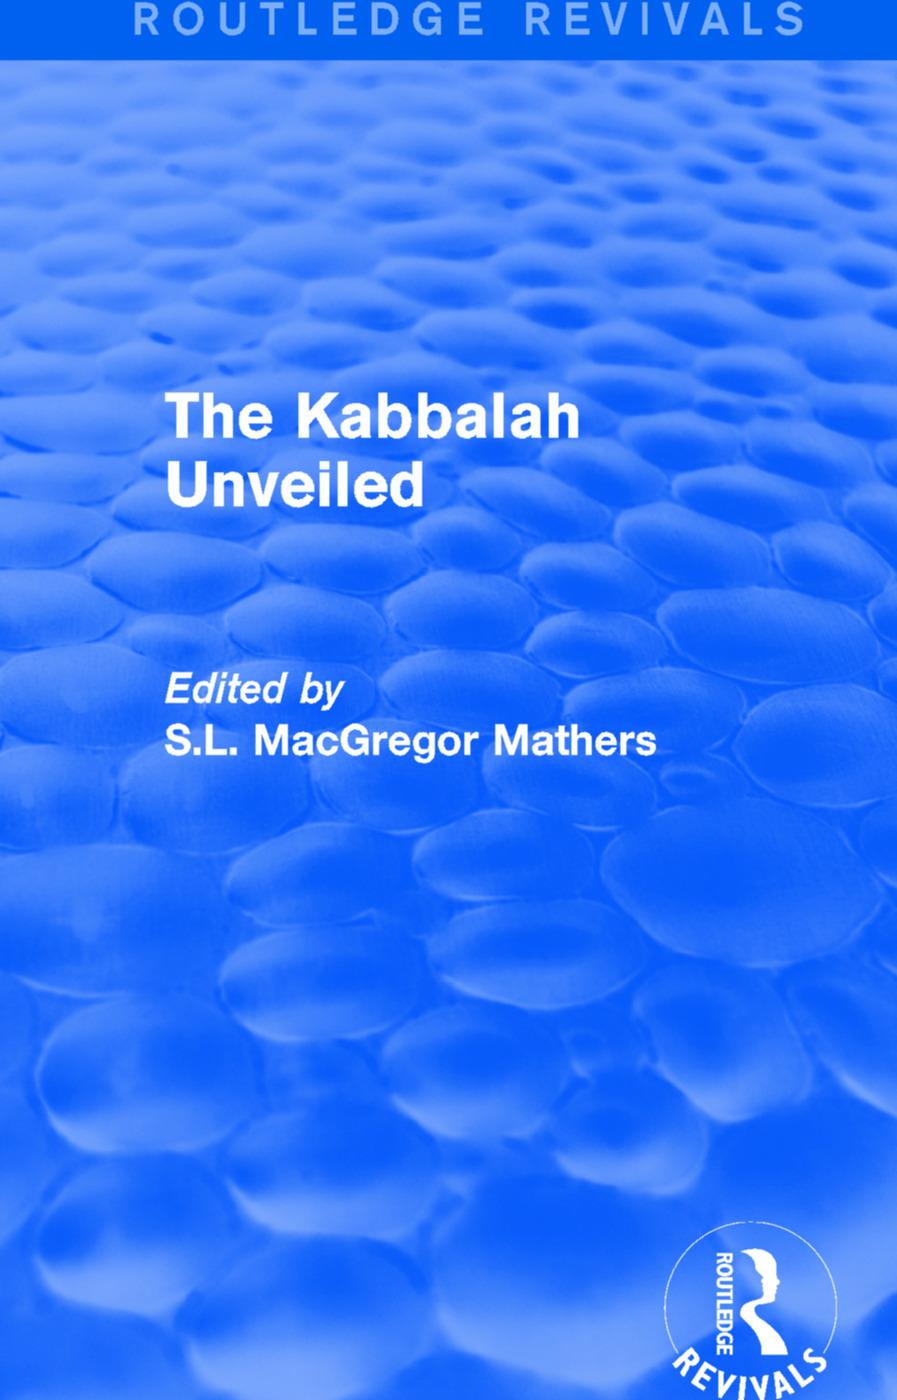 The Kabbalah Unveiled book cover